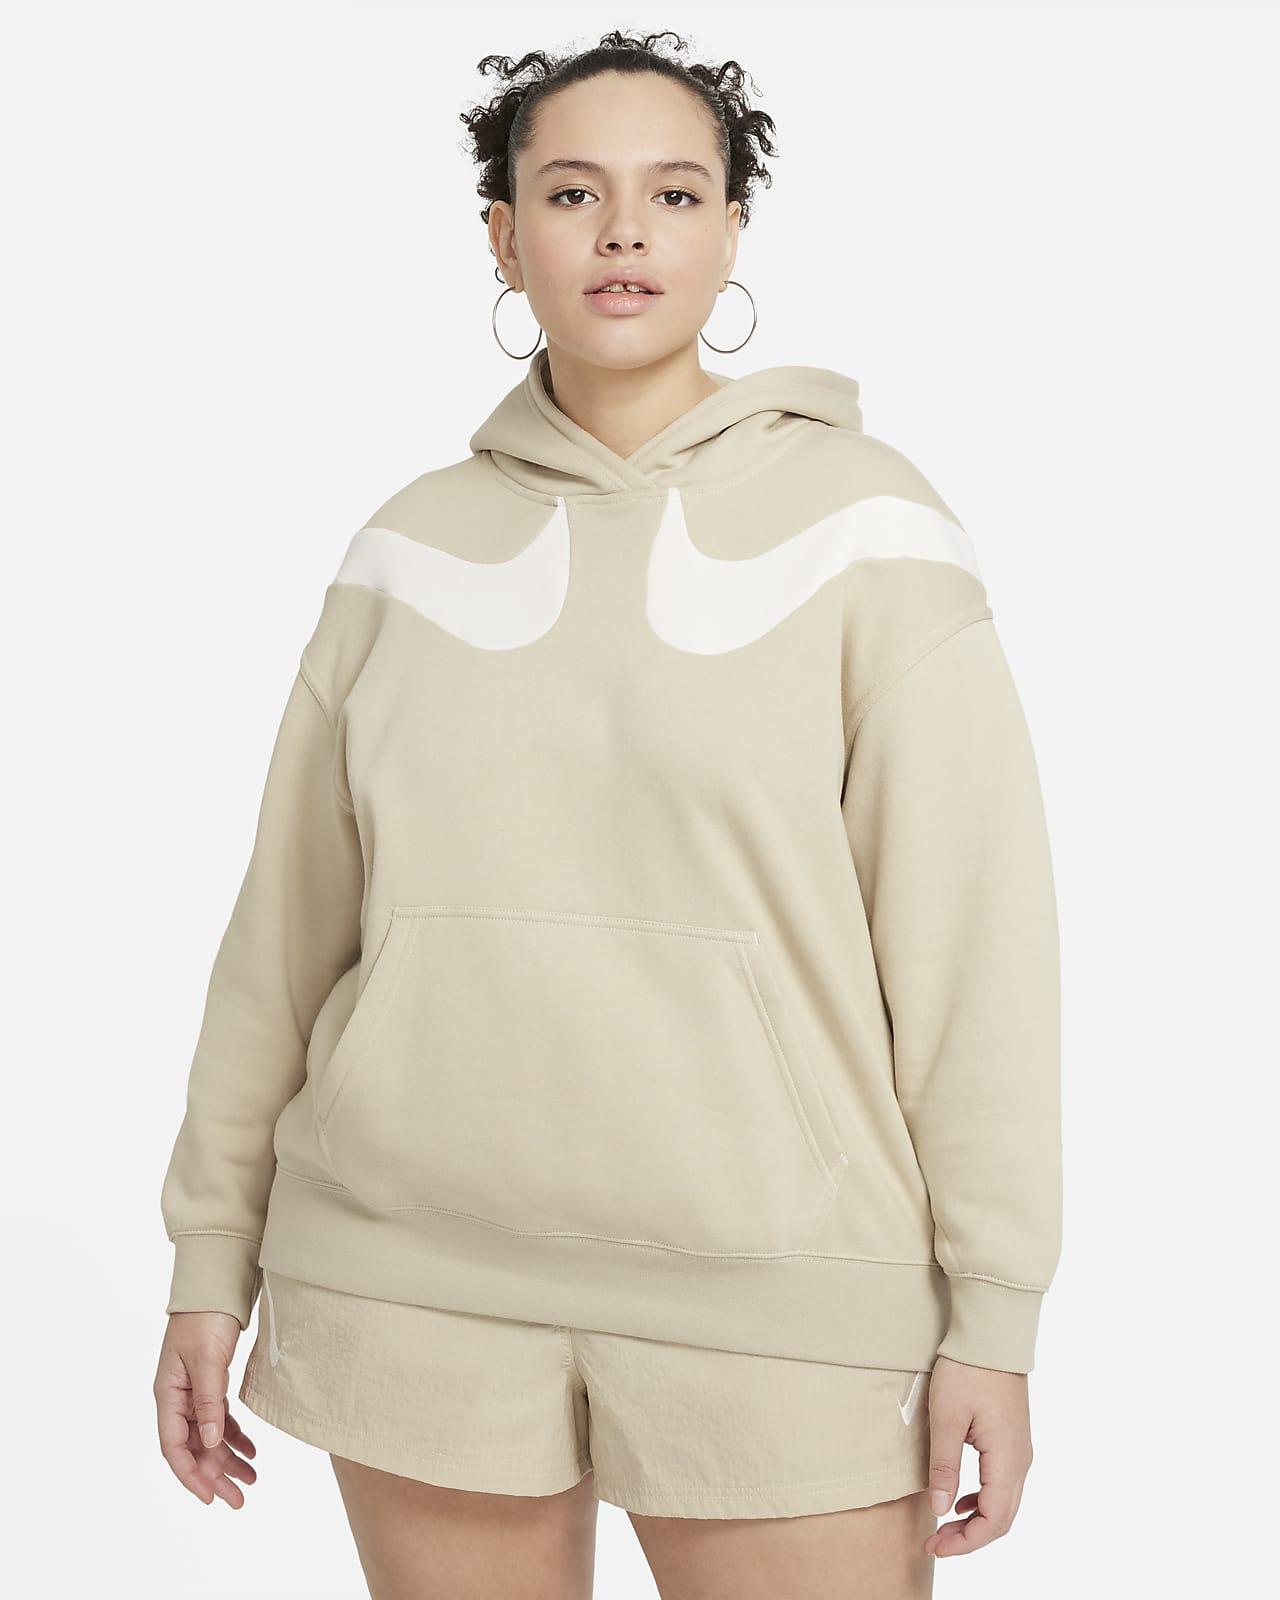 Sudadera con gorro de tejido Fleece oversized para mujer talla grande Nike Sportswear Swoosh